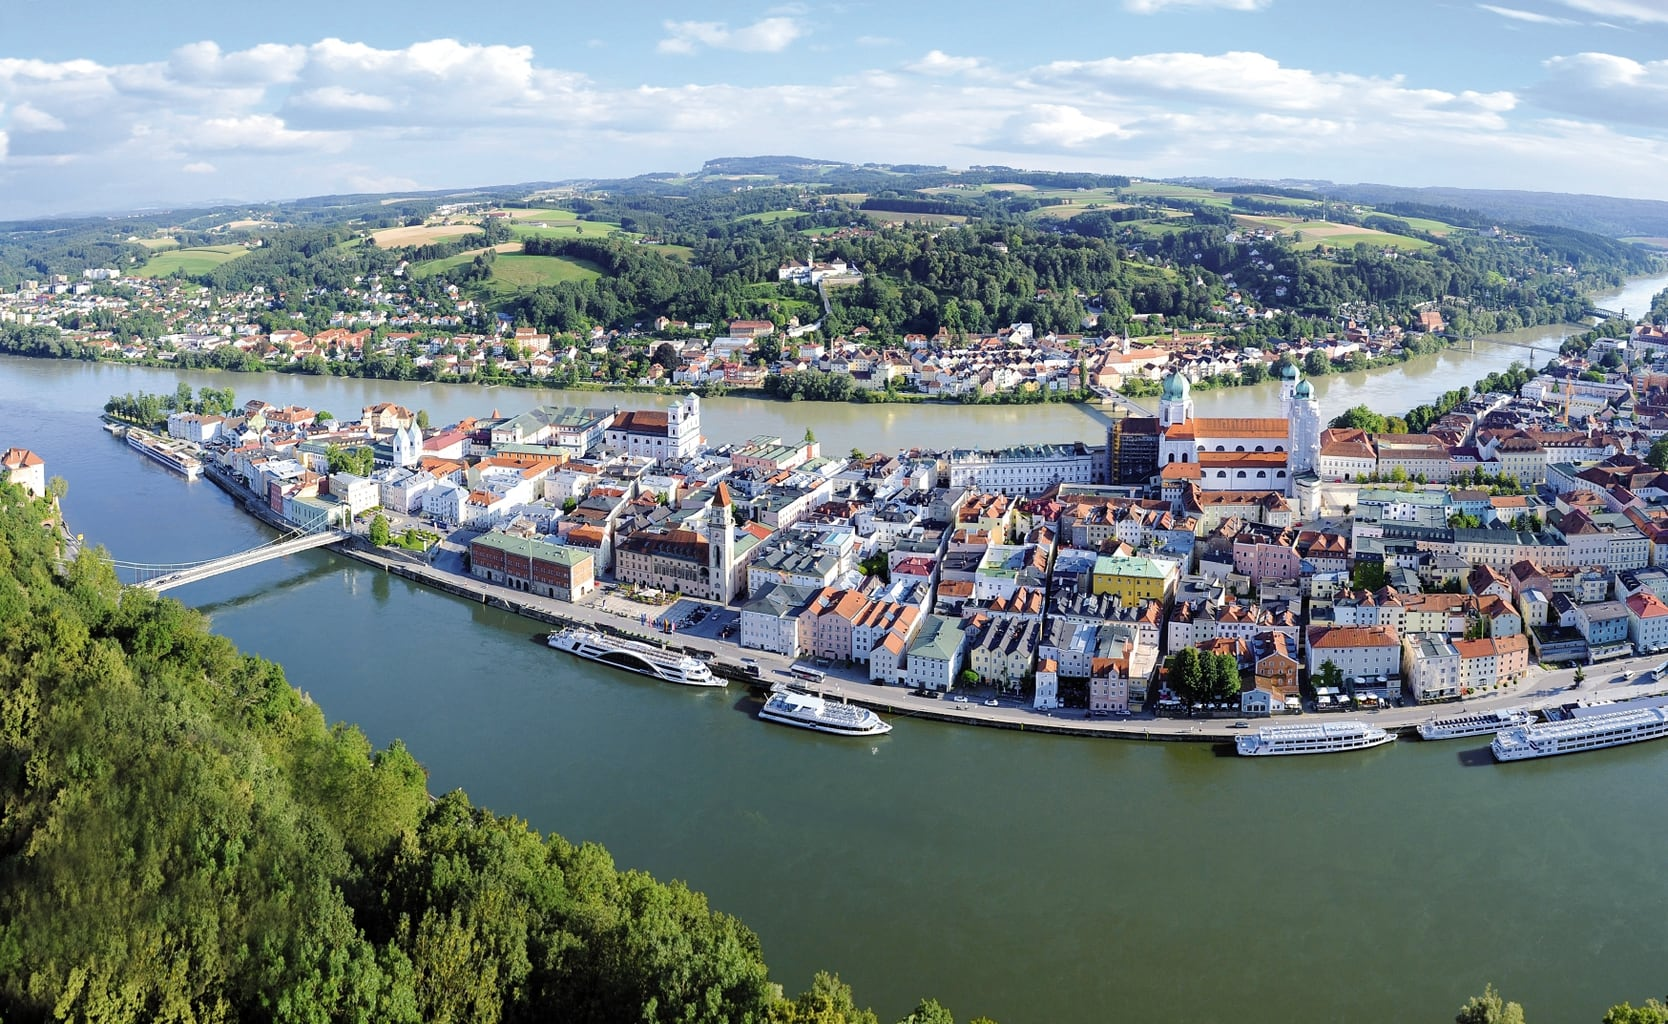 Panarama van de Beierse stad Passau vanuit de lucht